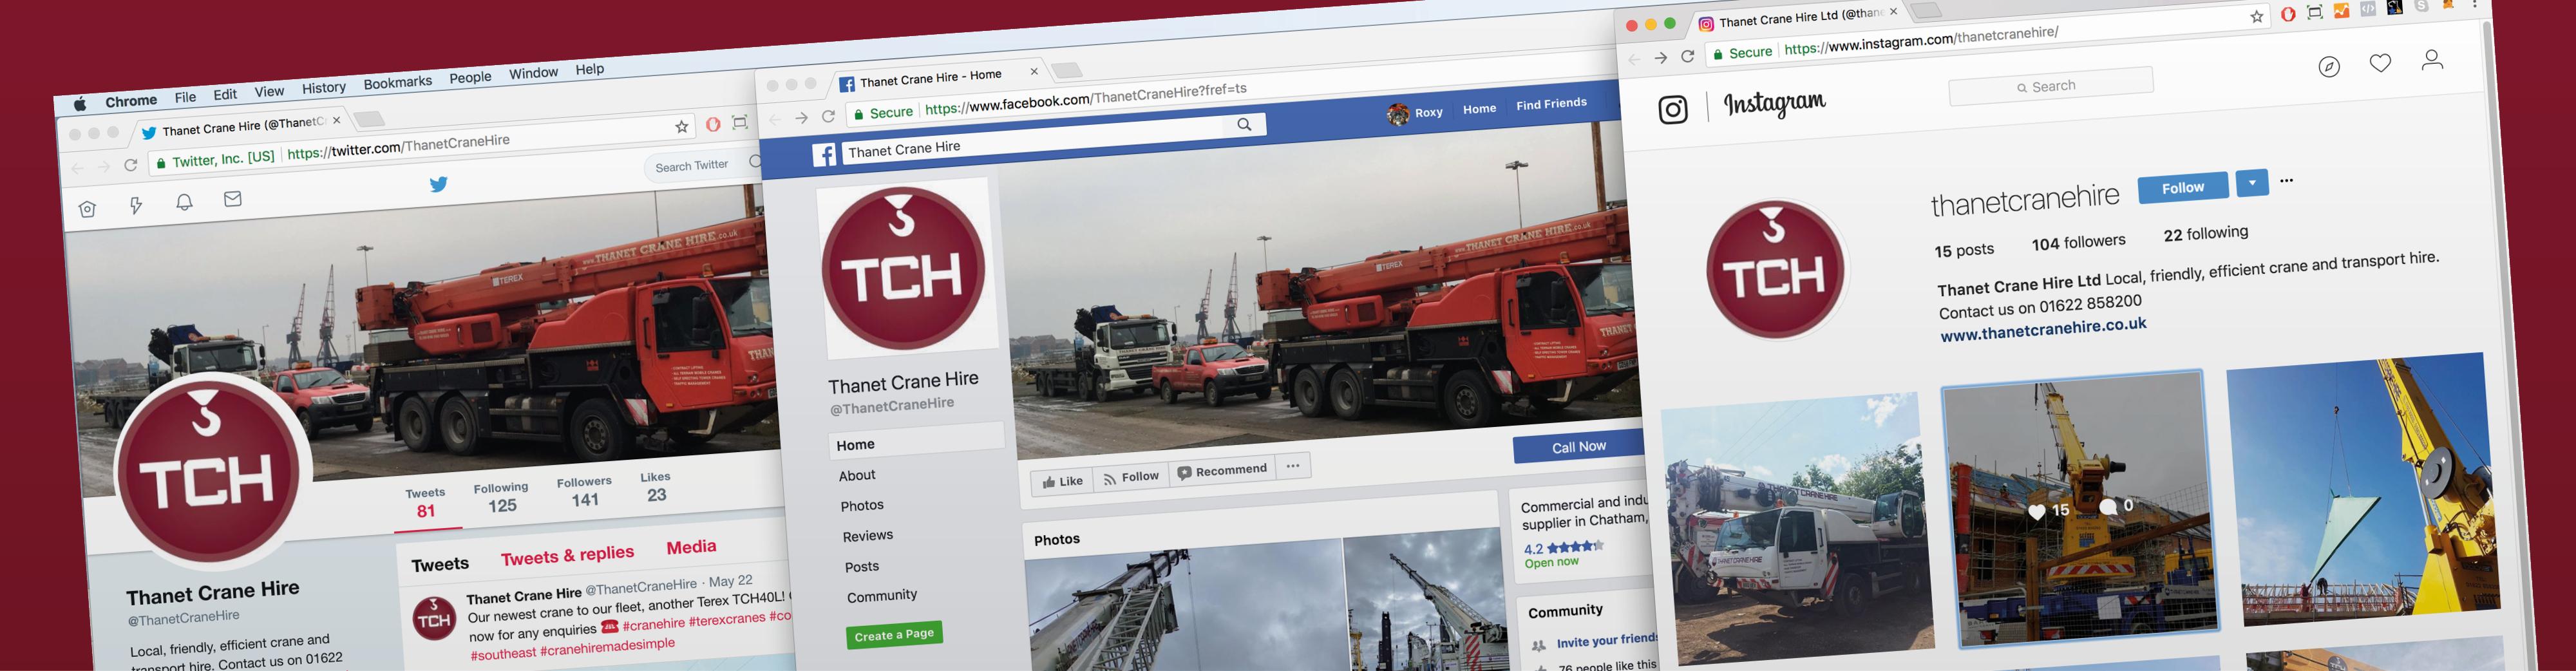 Popi produce social media campaigns